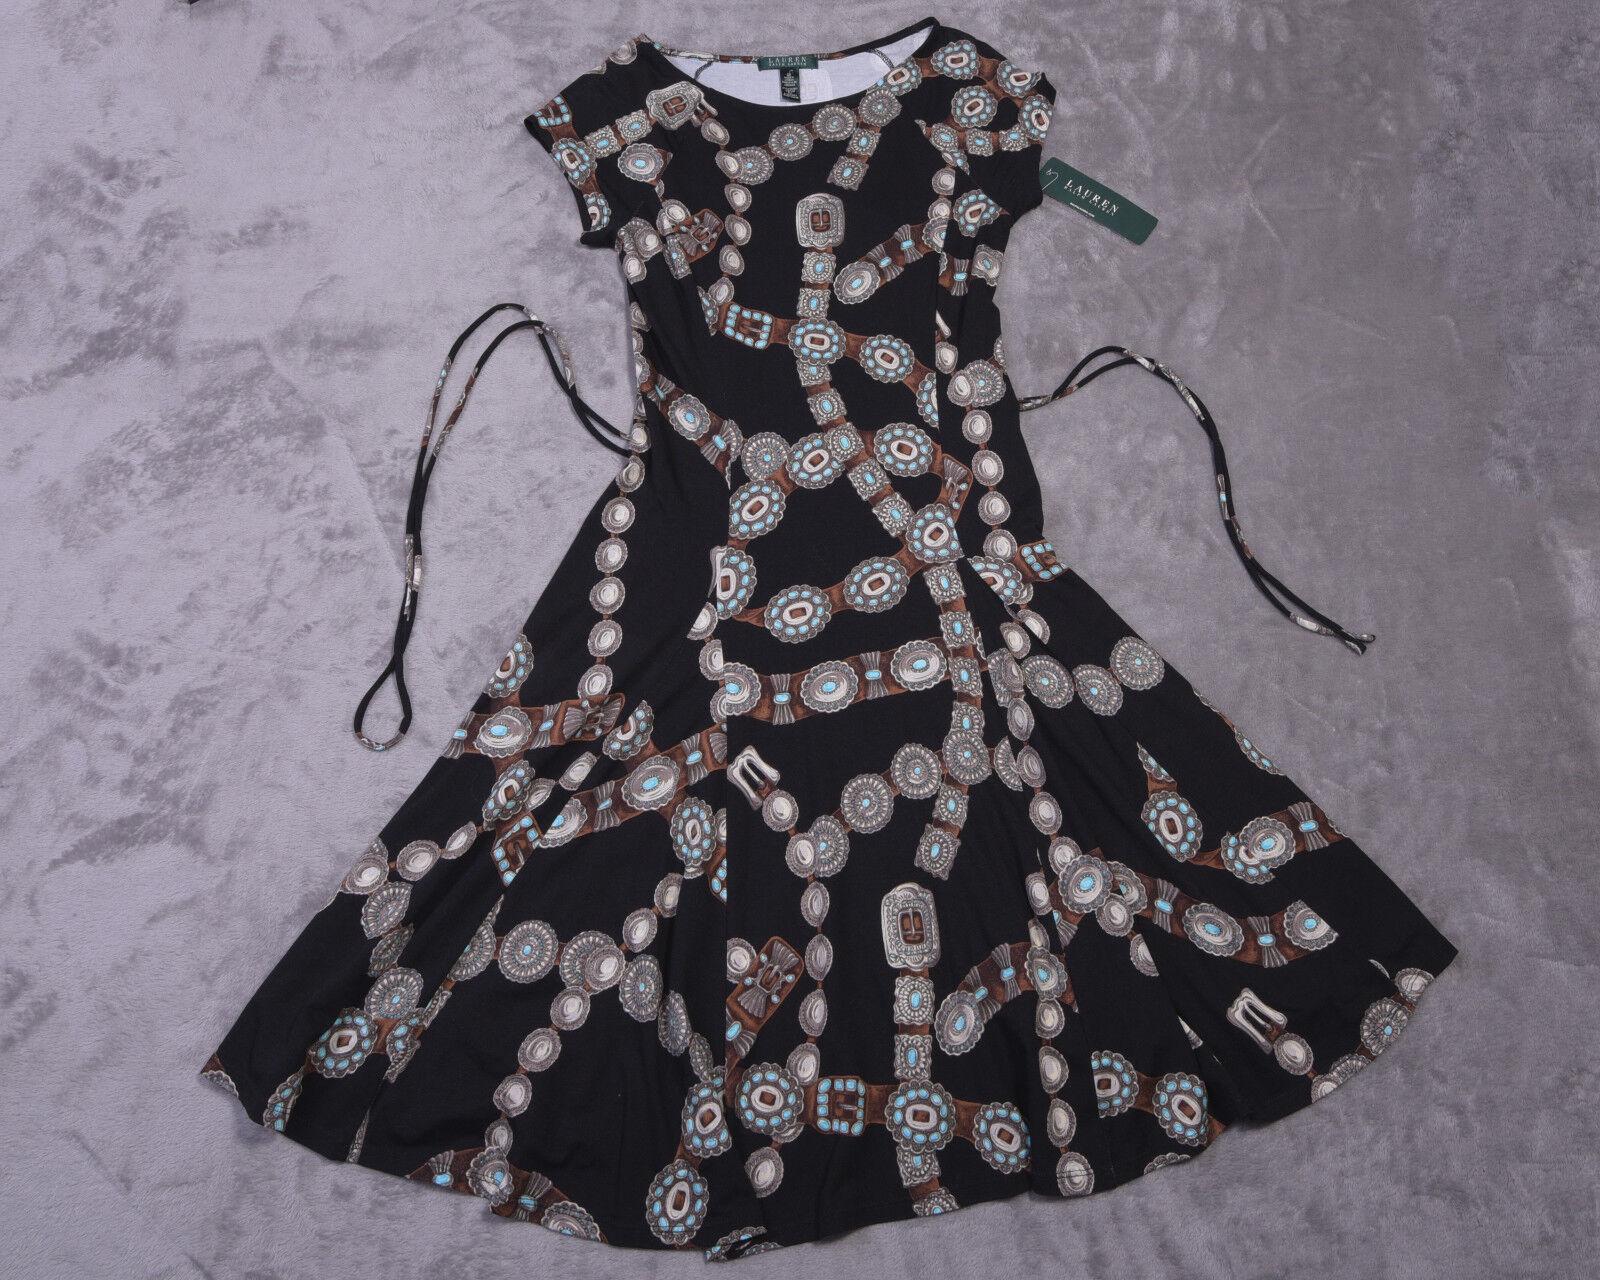 LAUREN RALPH LAUREN Womens DRESS Size Medium Medium Medium Tie Belt M NWT NEW 4efd48